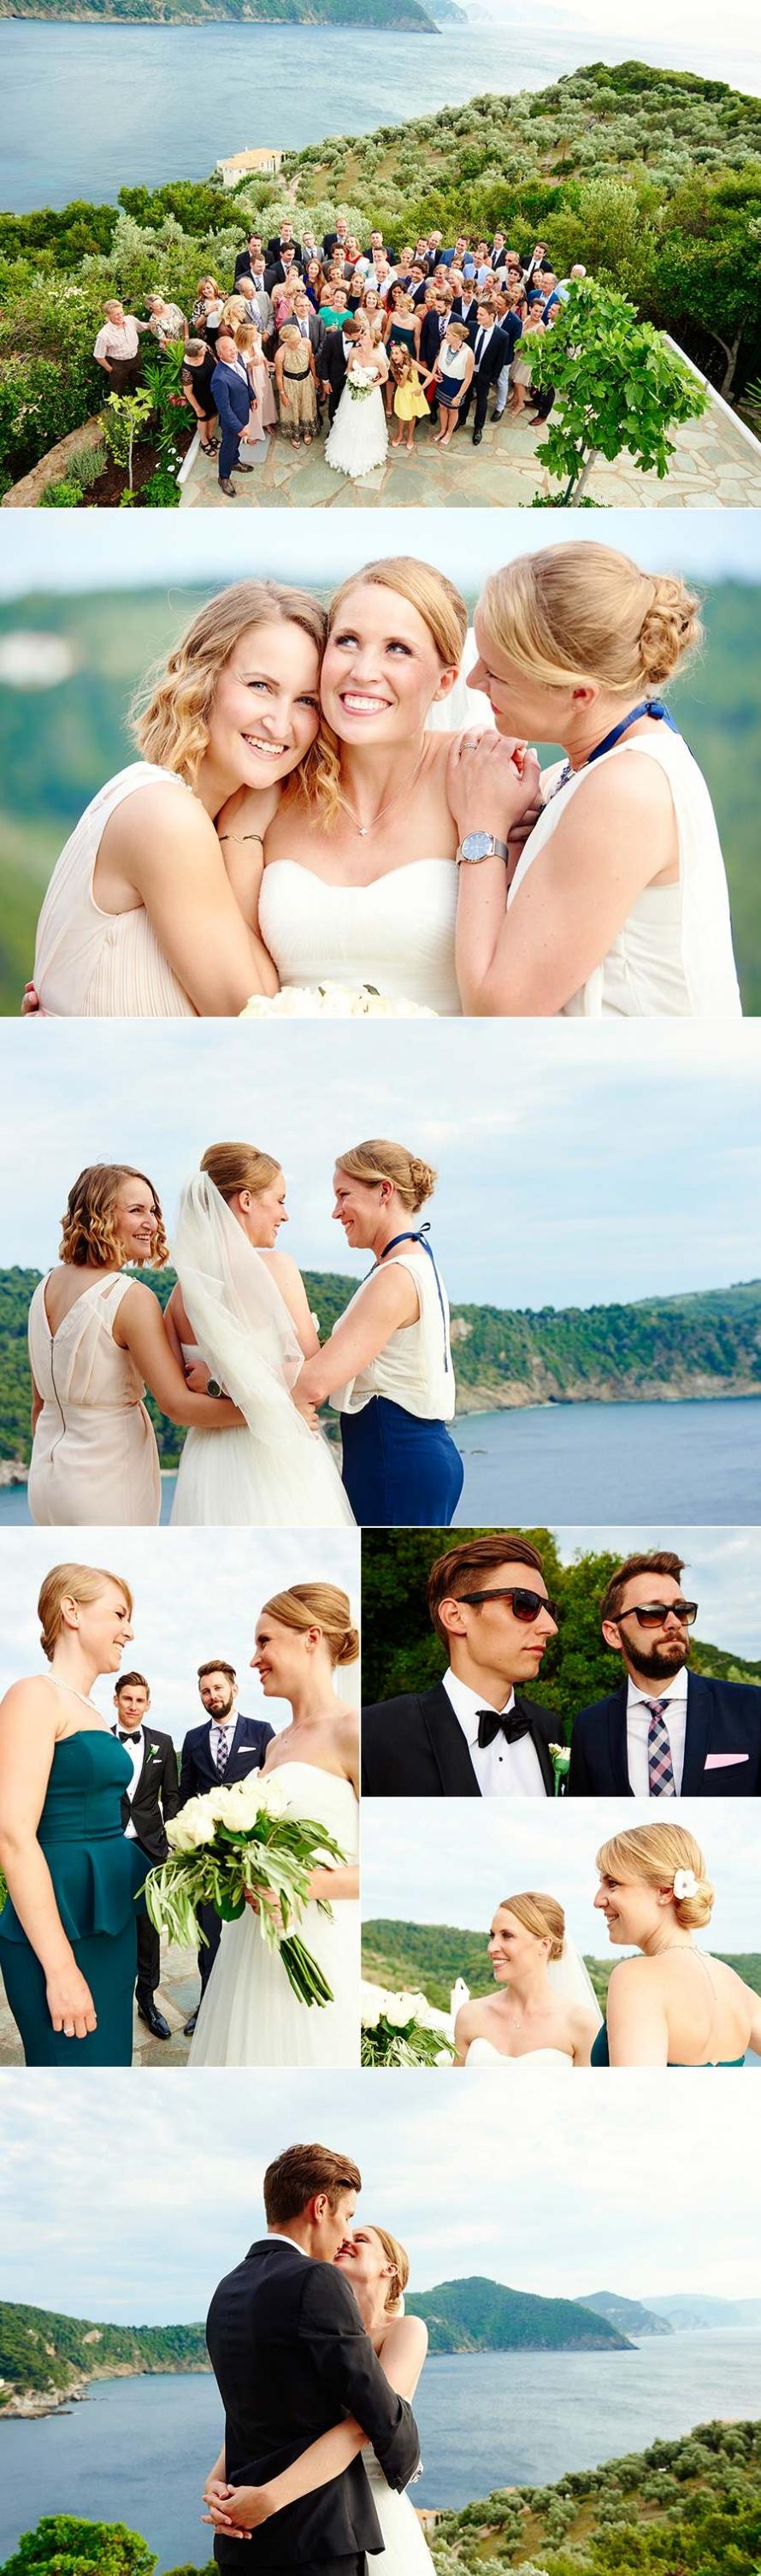 Tobi & Vanessa wedding photos 17